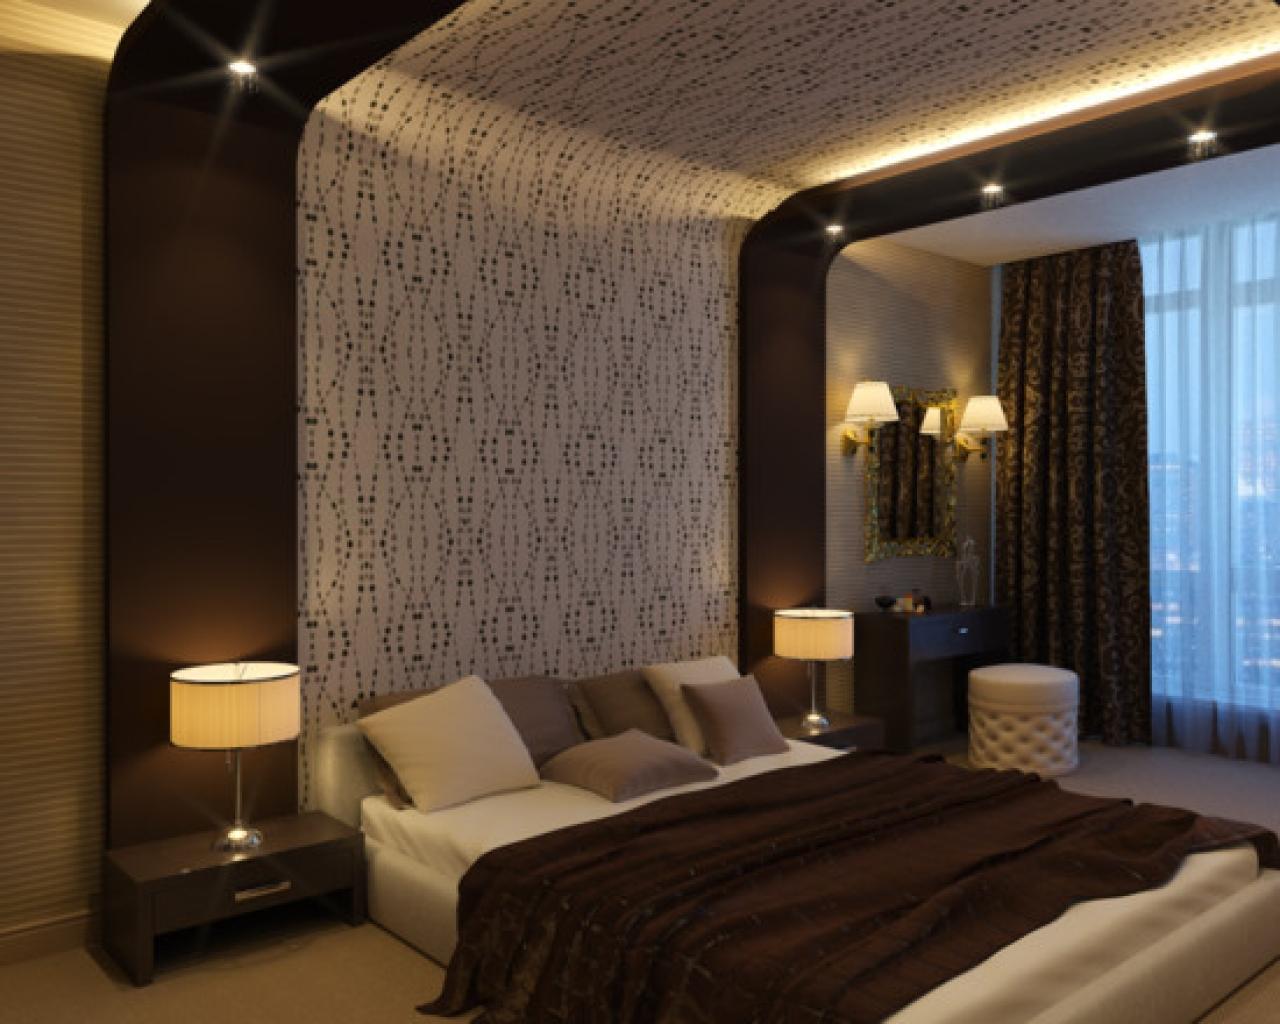 Chambre Brune : Дизайн спальни обои Картинки и фотографии дизайна